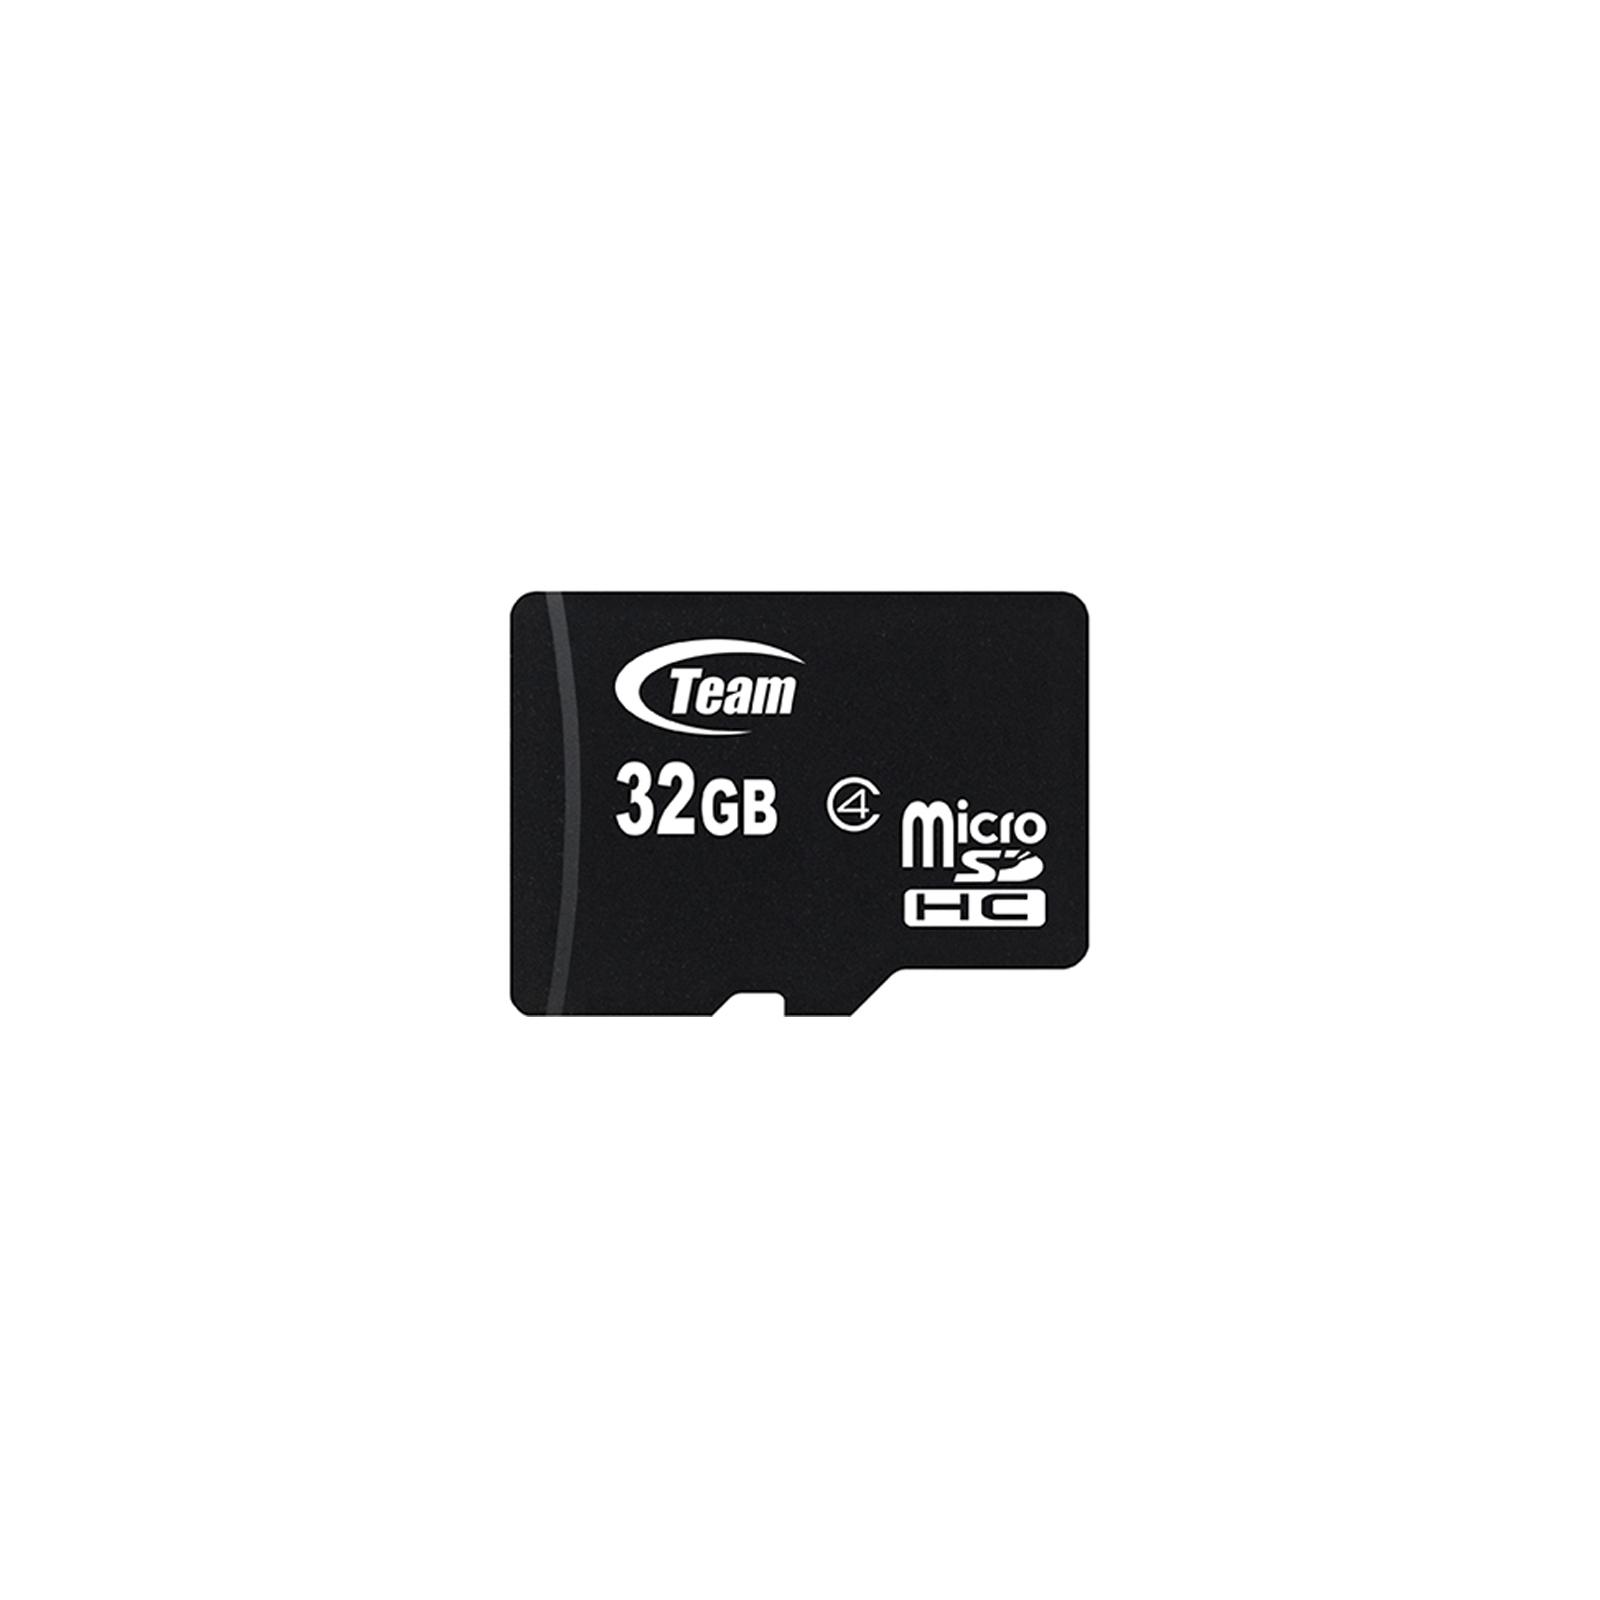 Карта памяти Team 32GB microSD Class 4 (TUSDH32GCL402)